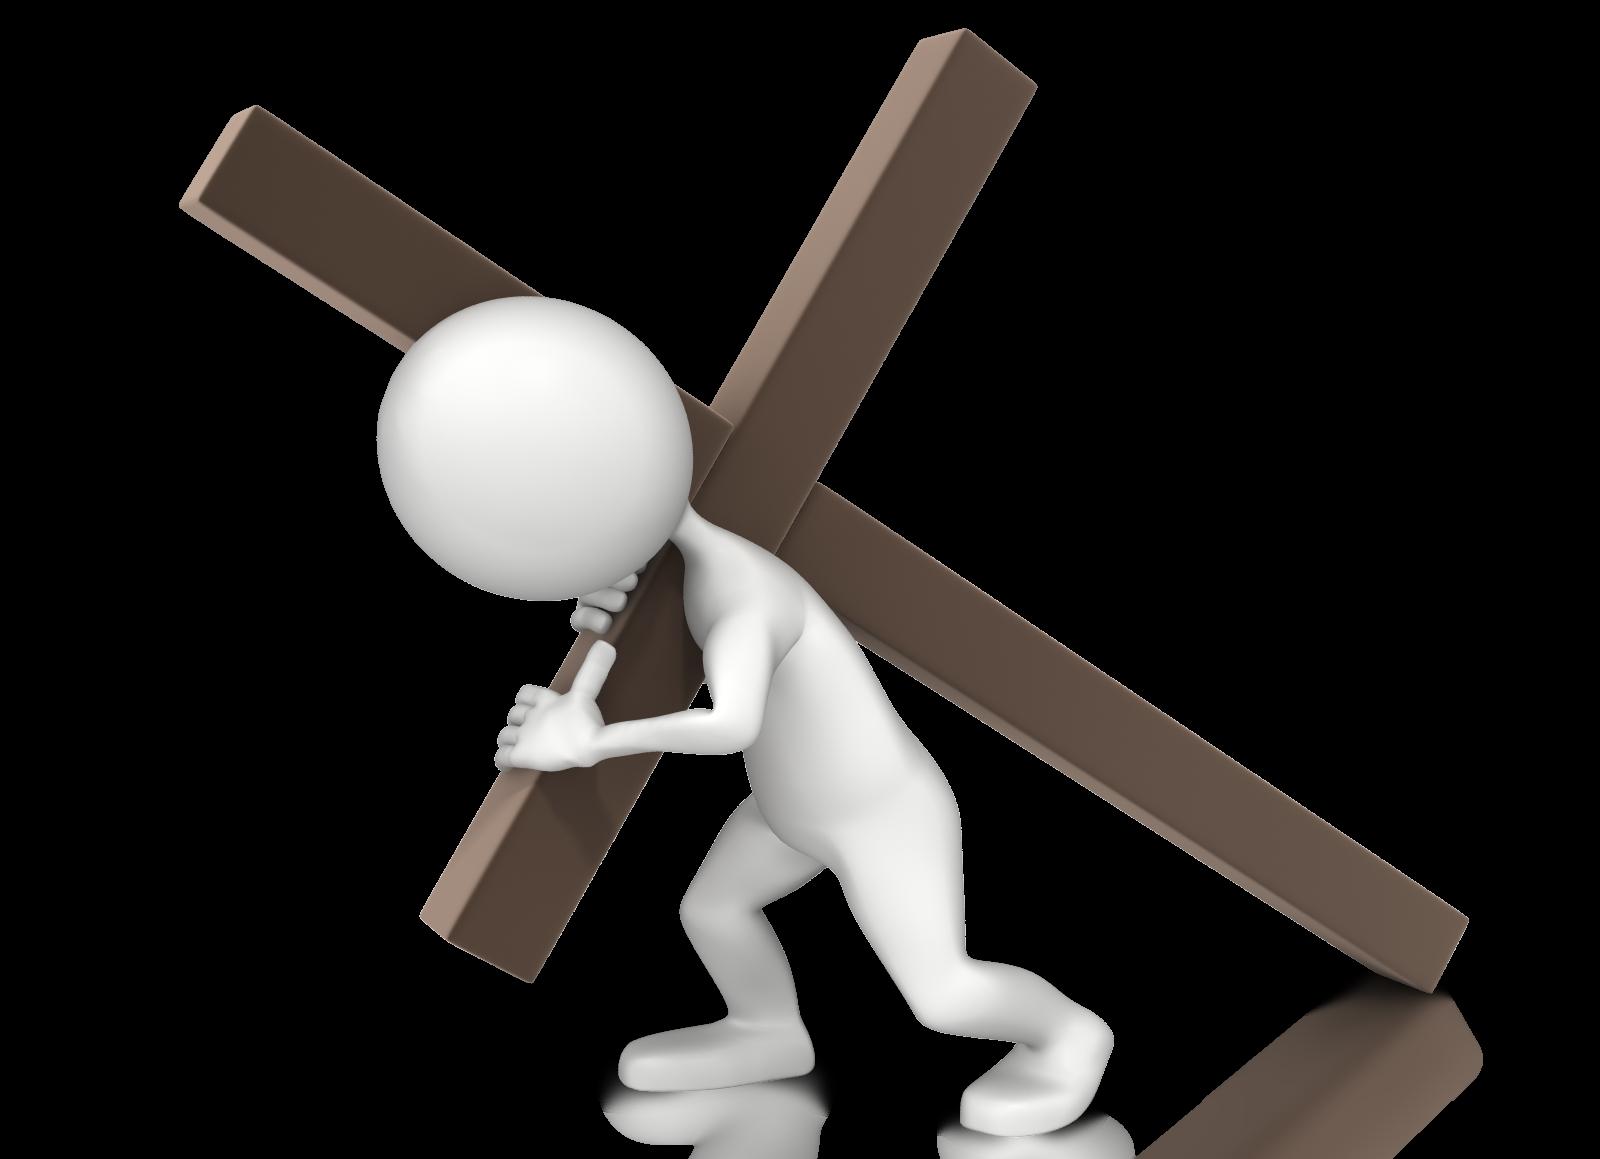 dibujo llevando la cruz fondo